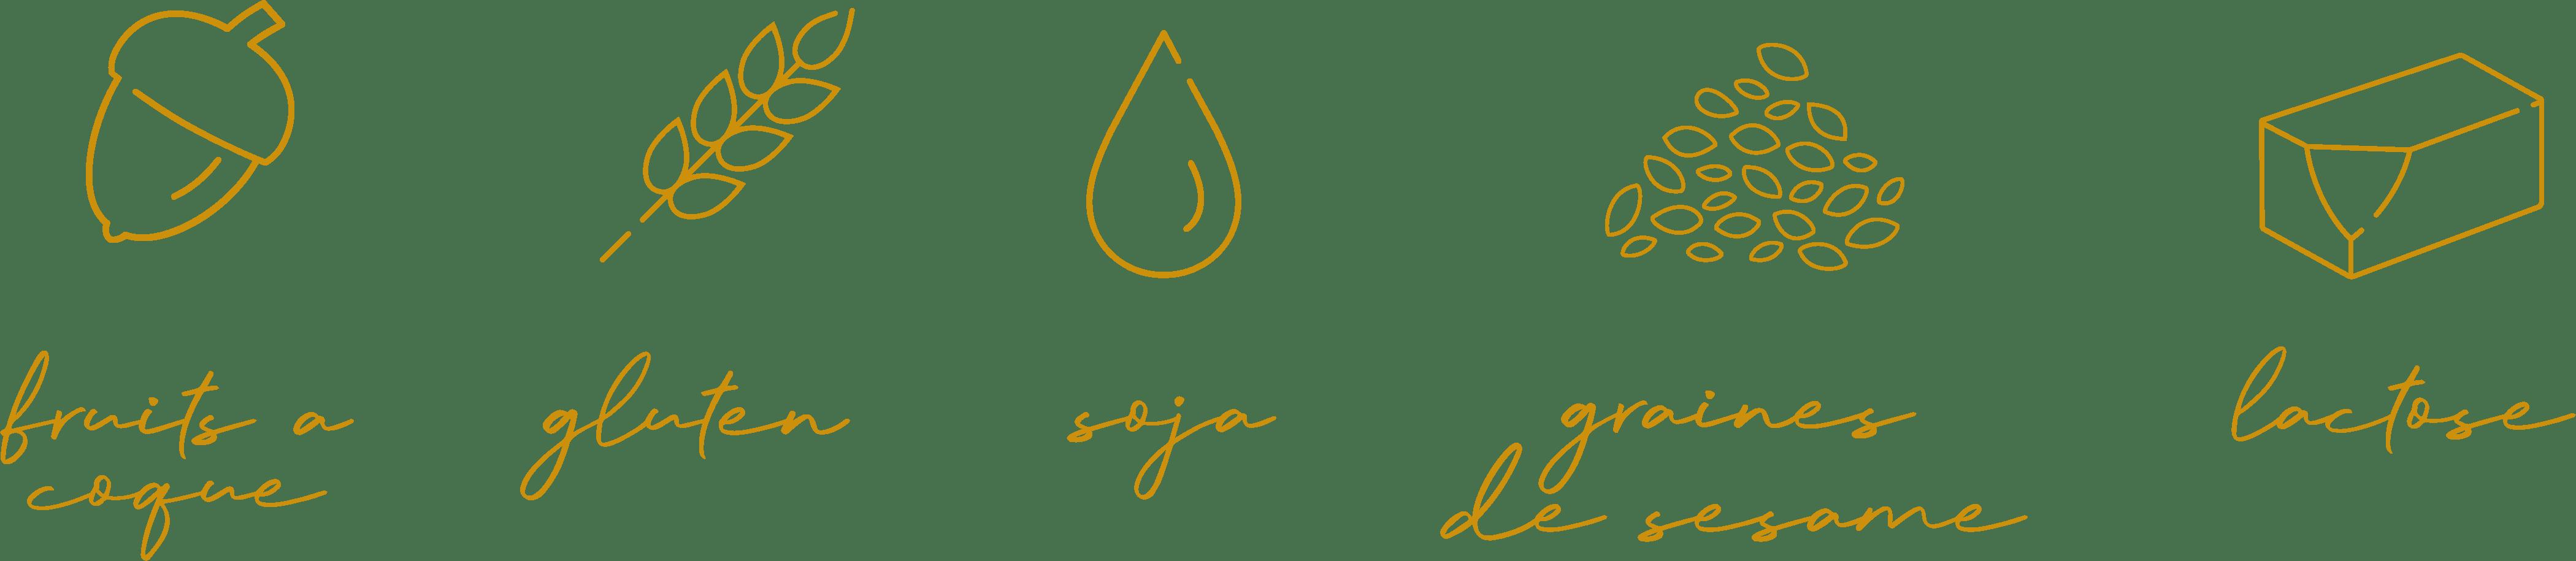 lormiellerie-pâtisserie-marocaine-facebook-allergenes-ok